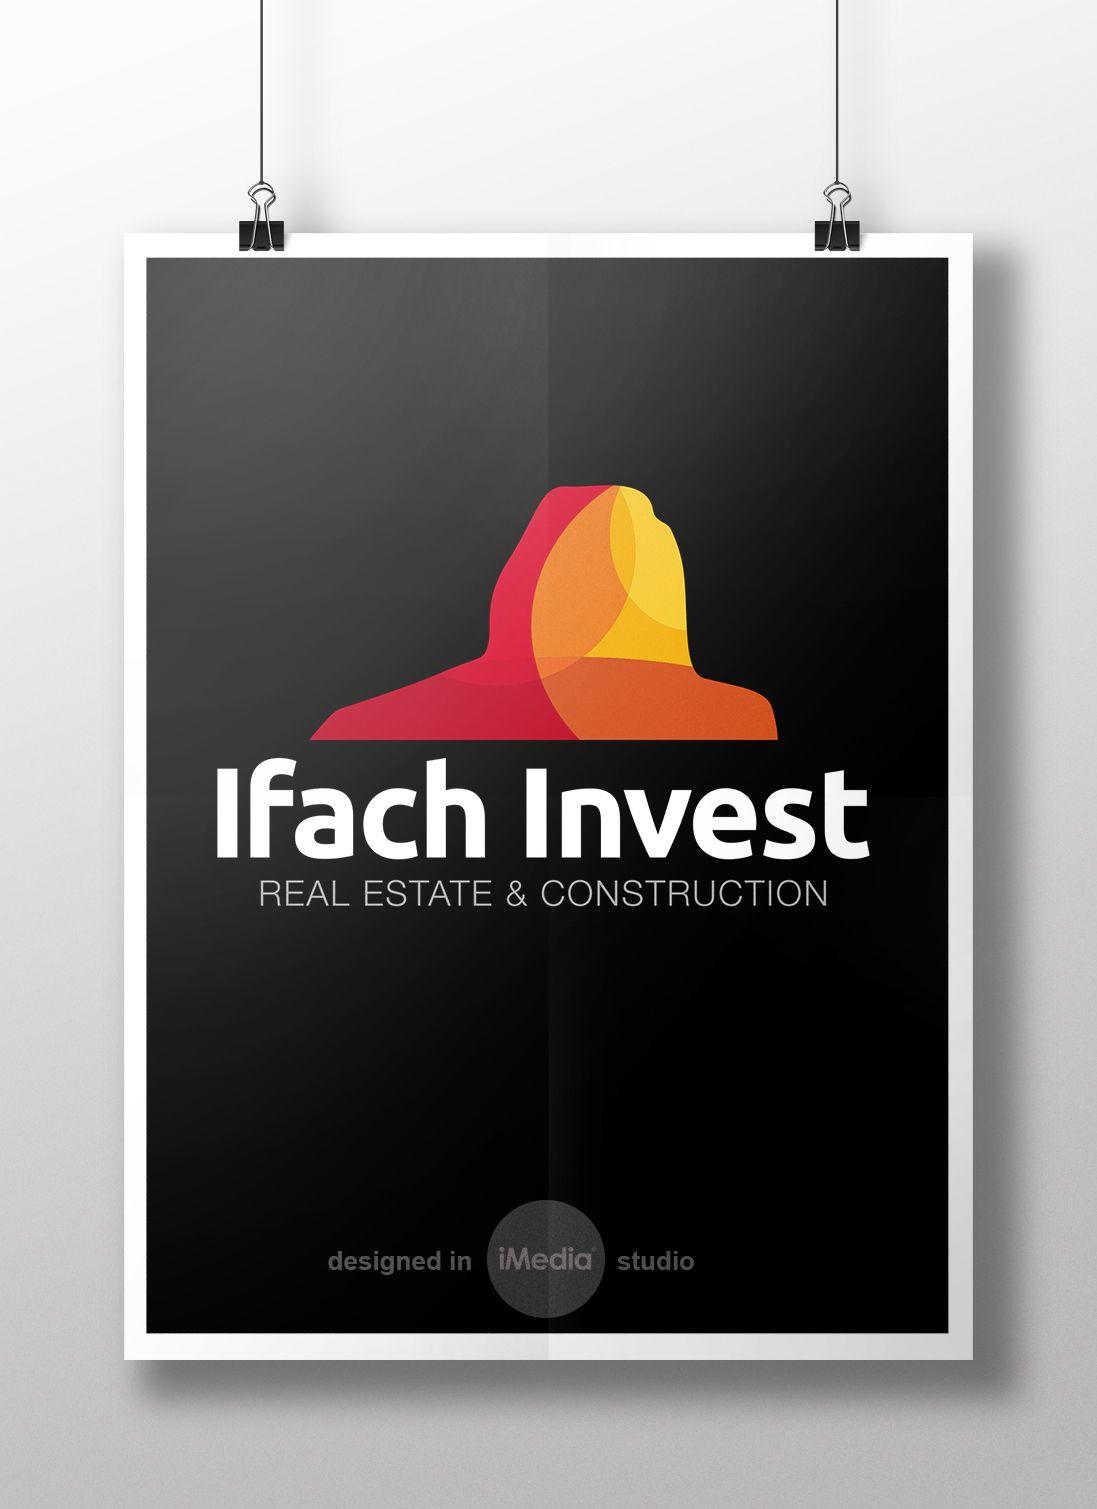 Dise O Logo Para La Inmobiliaria Ifach Invest Calpe Costa  # Muebles Pascual Rius